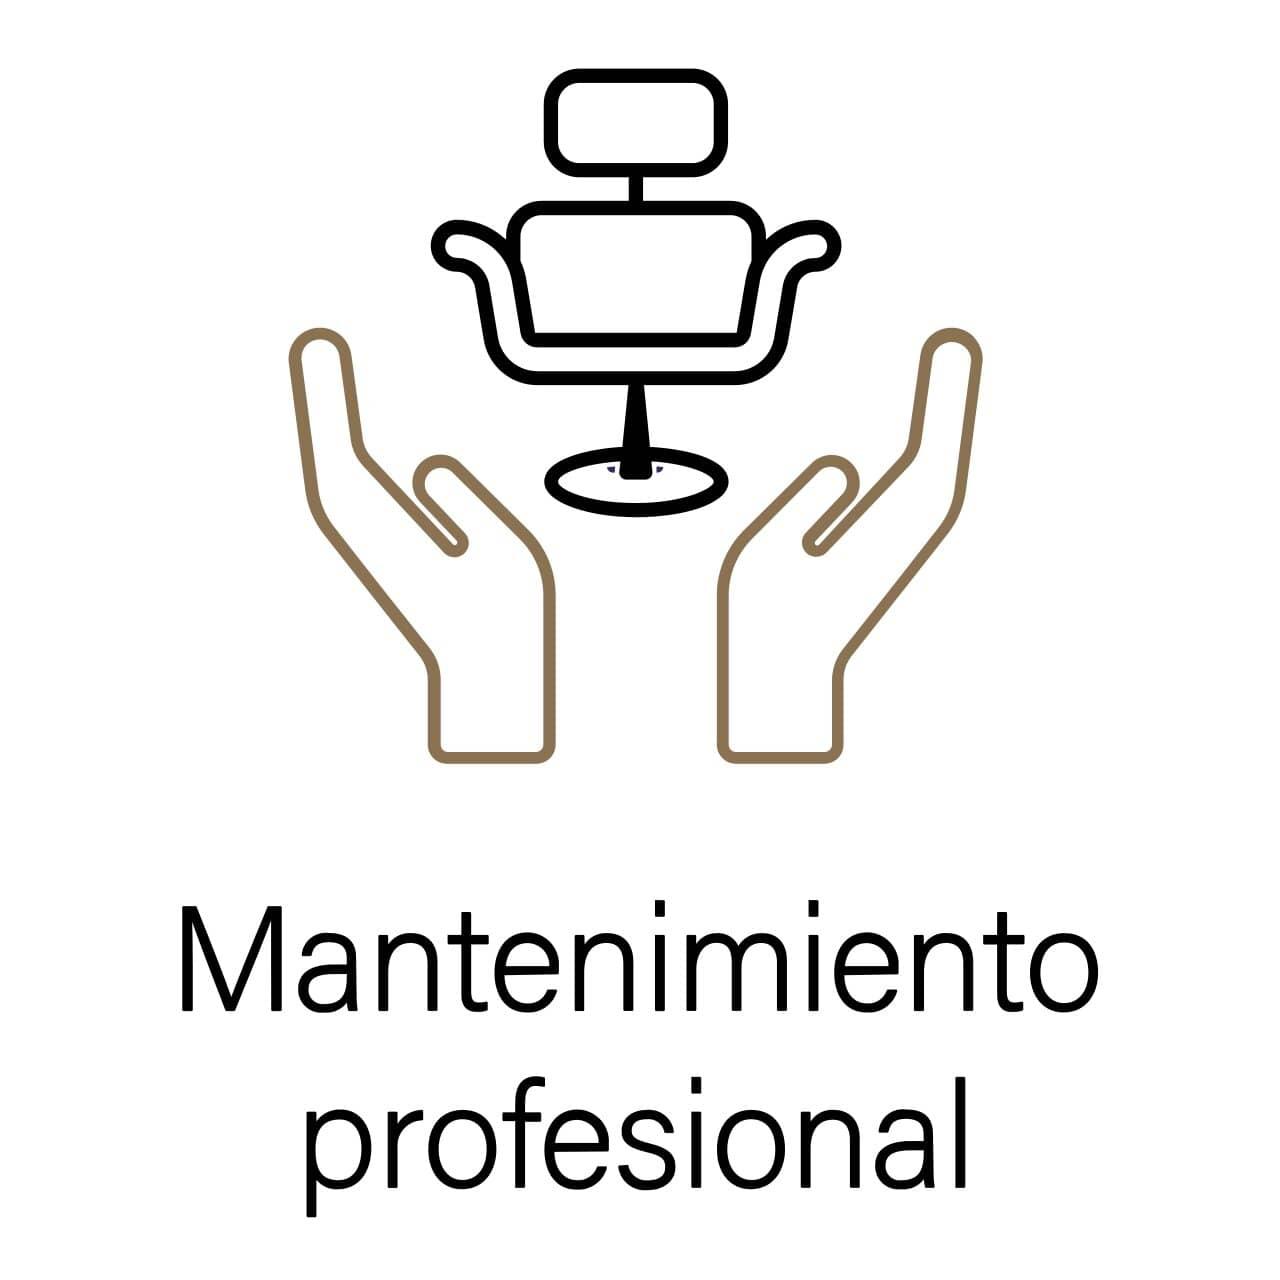 Mantenimiento profesional